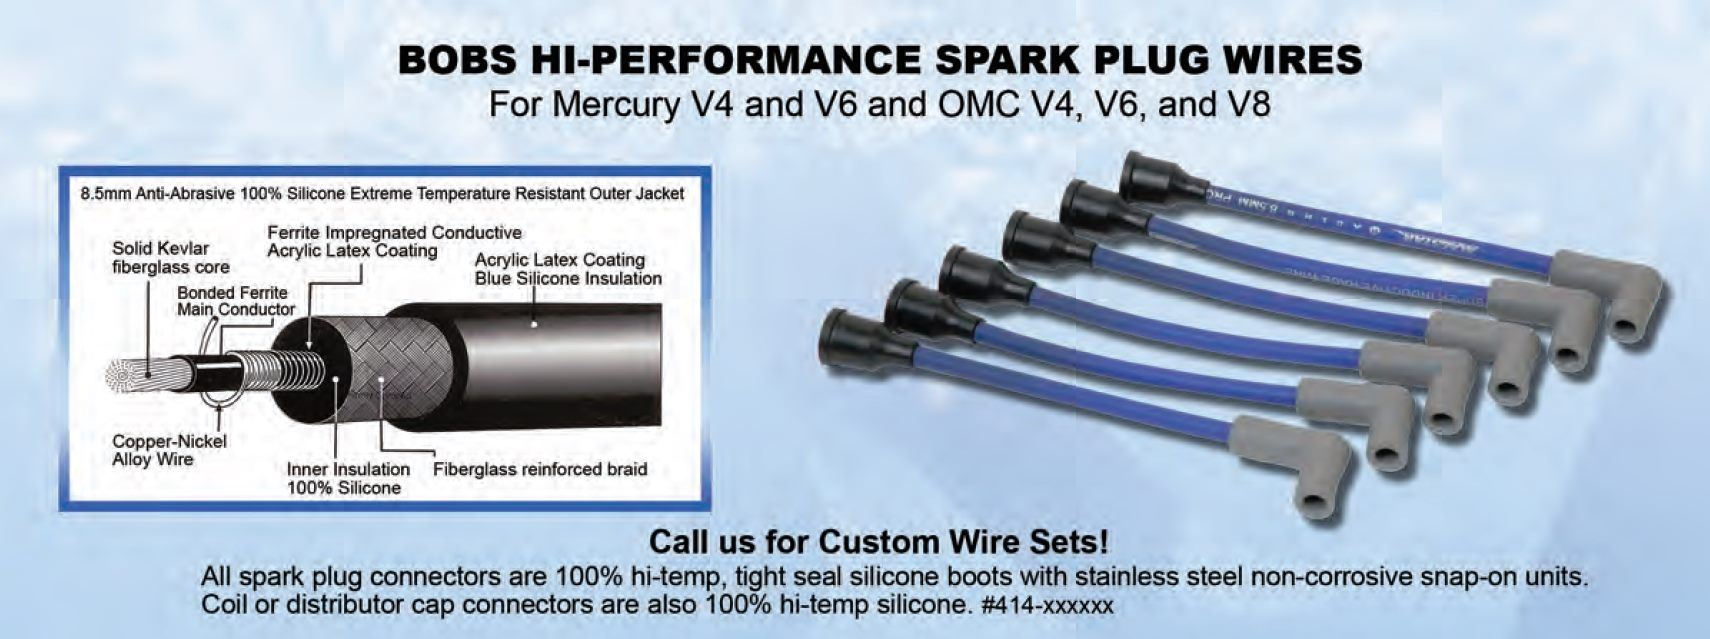 Spark Plug Wires: OMC V8 Set